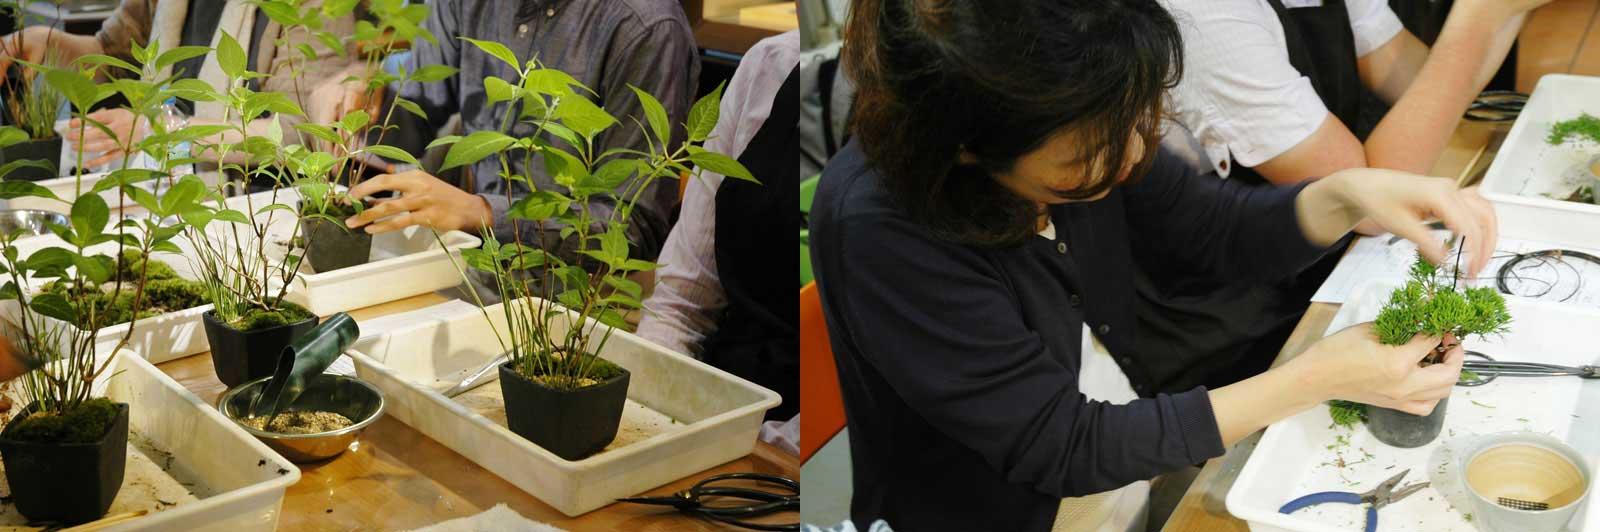 中目黒の盆栽教室